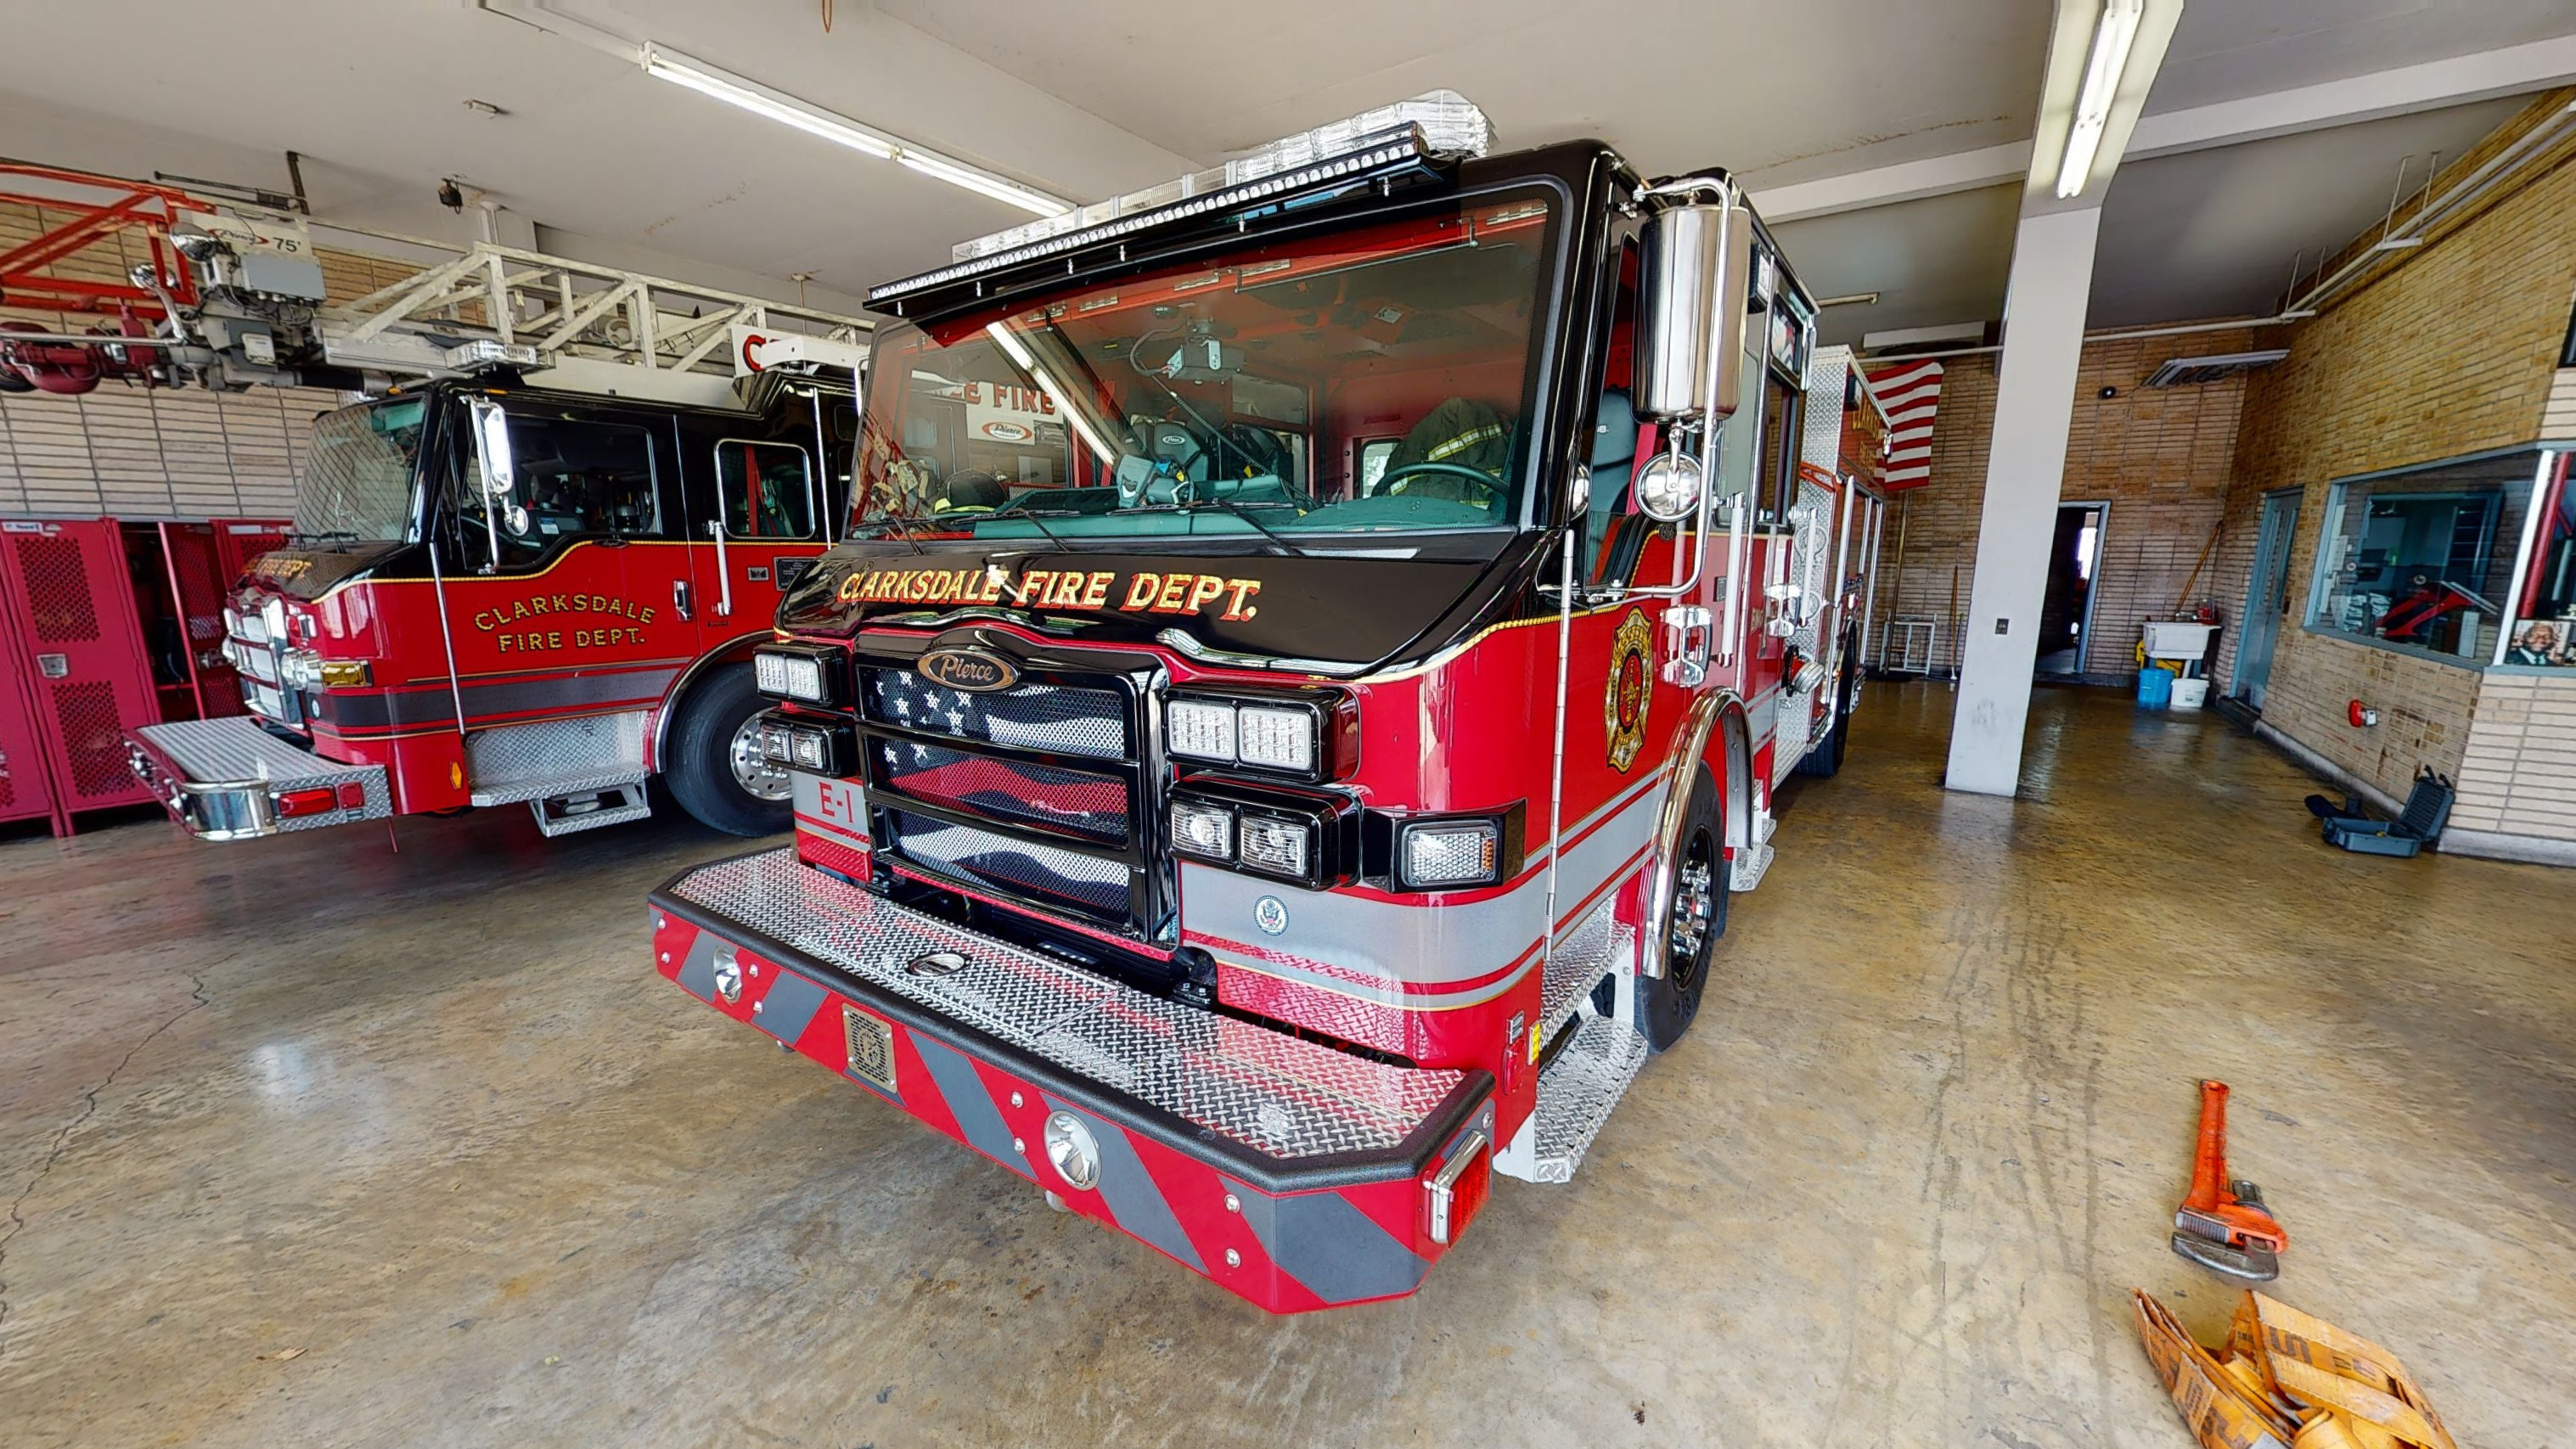 9_Clarksdale-Fire-Dept-06072021_112119